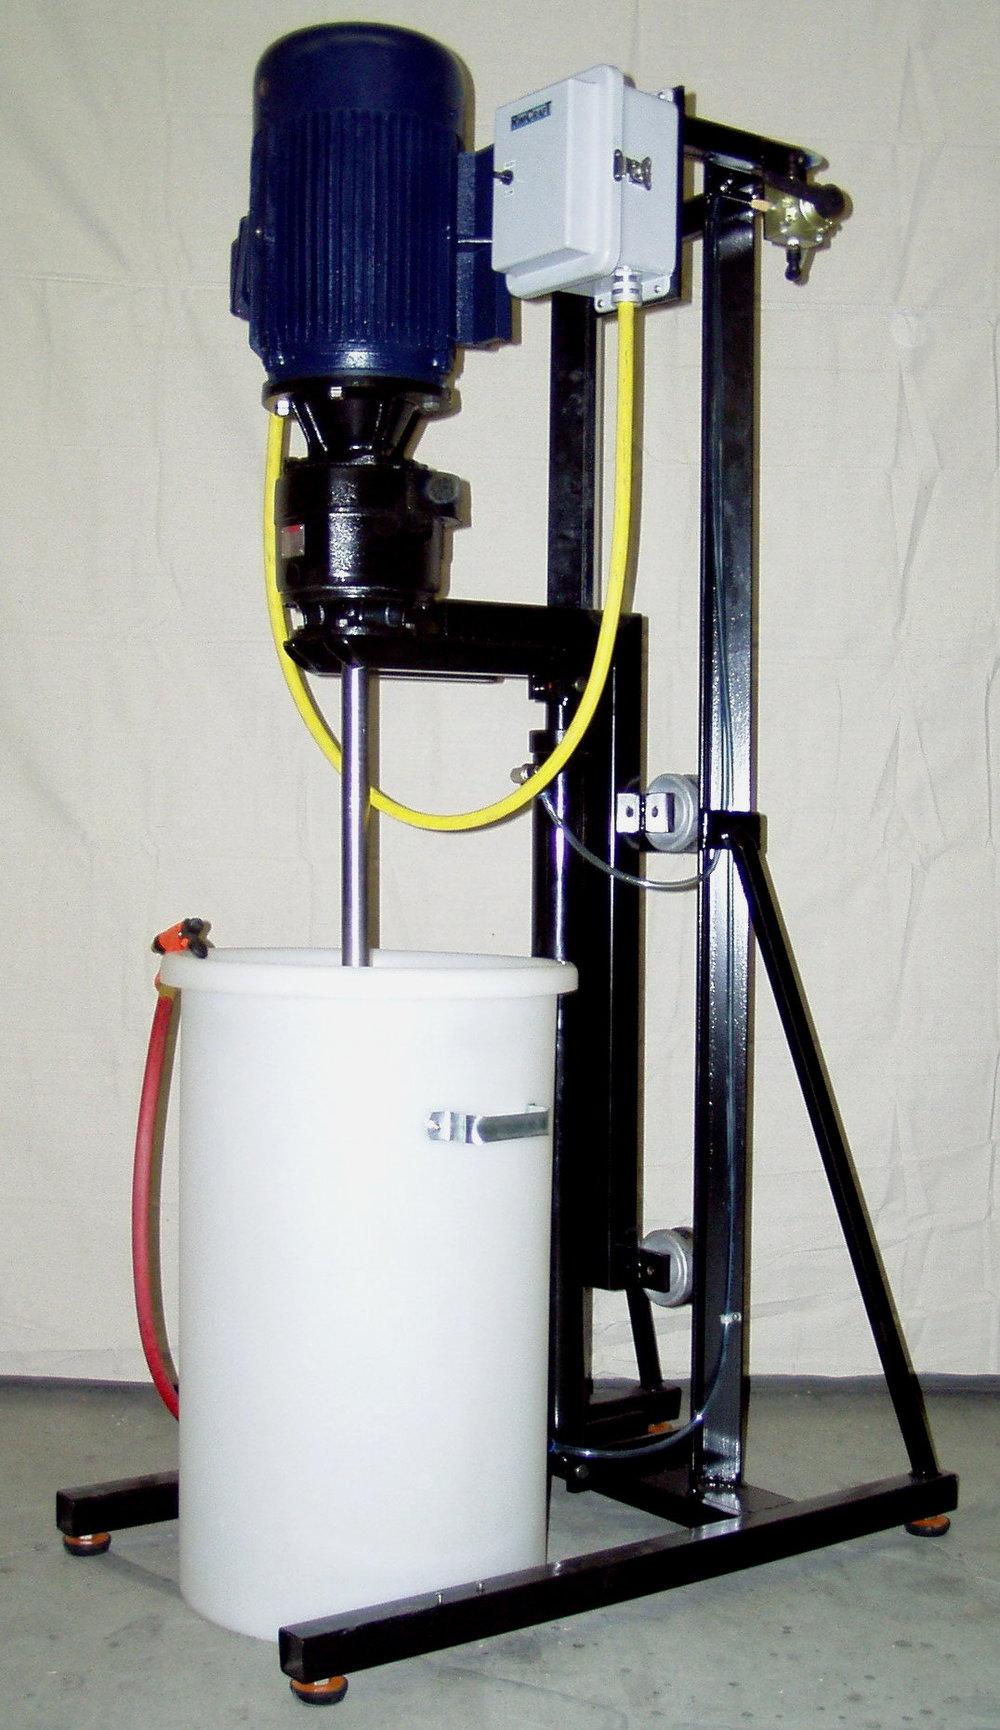 30 Gallon 10Hp Max Mixer.JPG